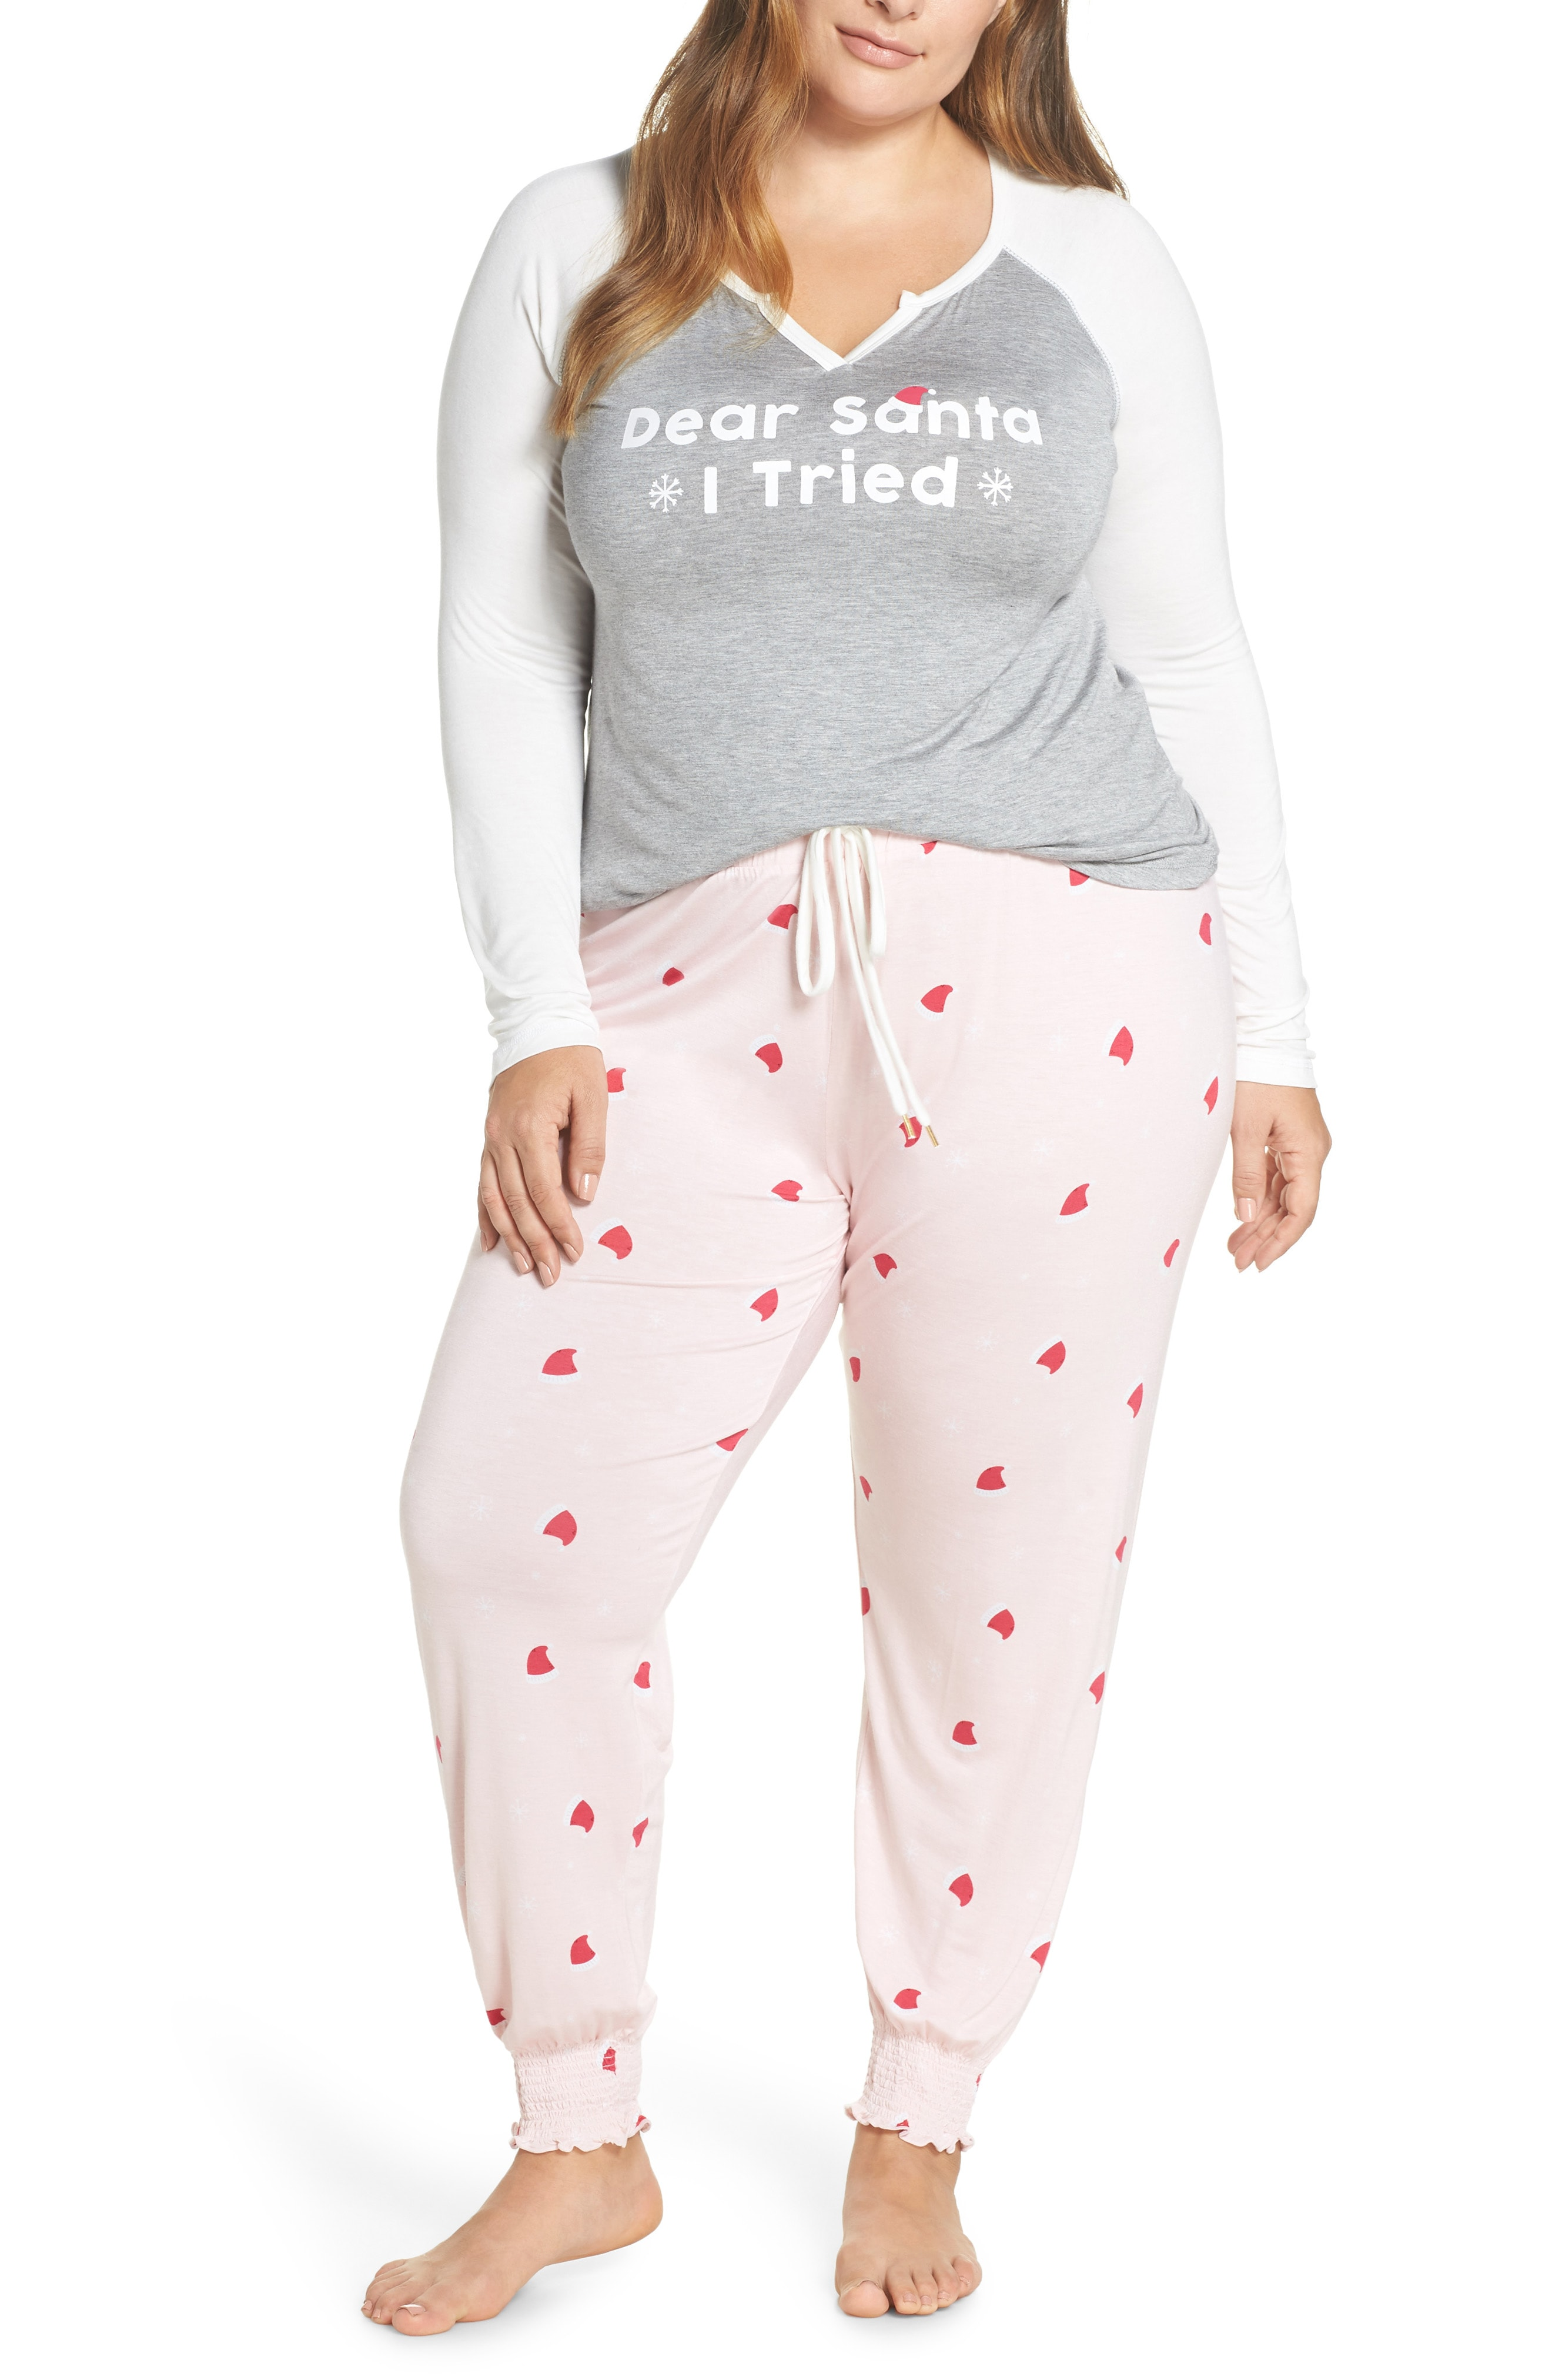 Honeydew Intimates Winter Breaker Pajamas (Plus Size)